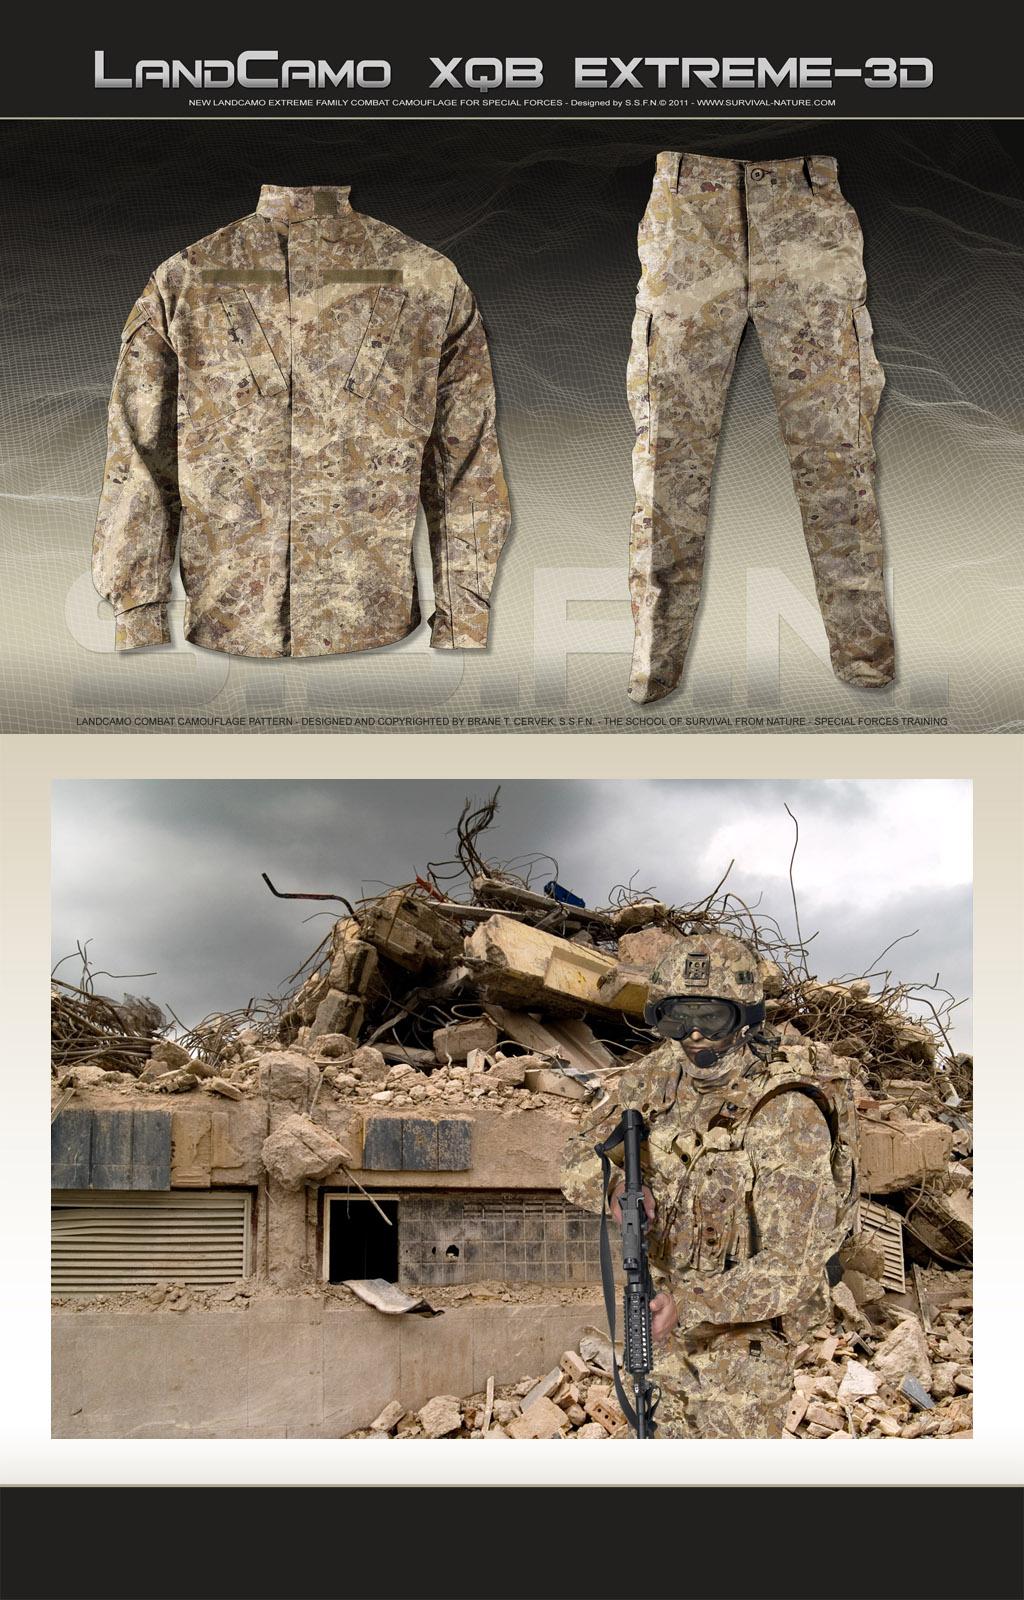 SSFN LandCamo XQB Extreme 3D Combat Camouflage Pattern 1 <!  :en  >SSFN ExtremePro LandCamo Terrain Specific/Mission Specific Digital Combat Camouflage Patterns <!  :  >